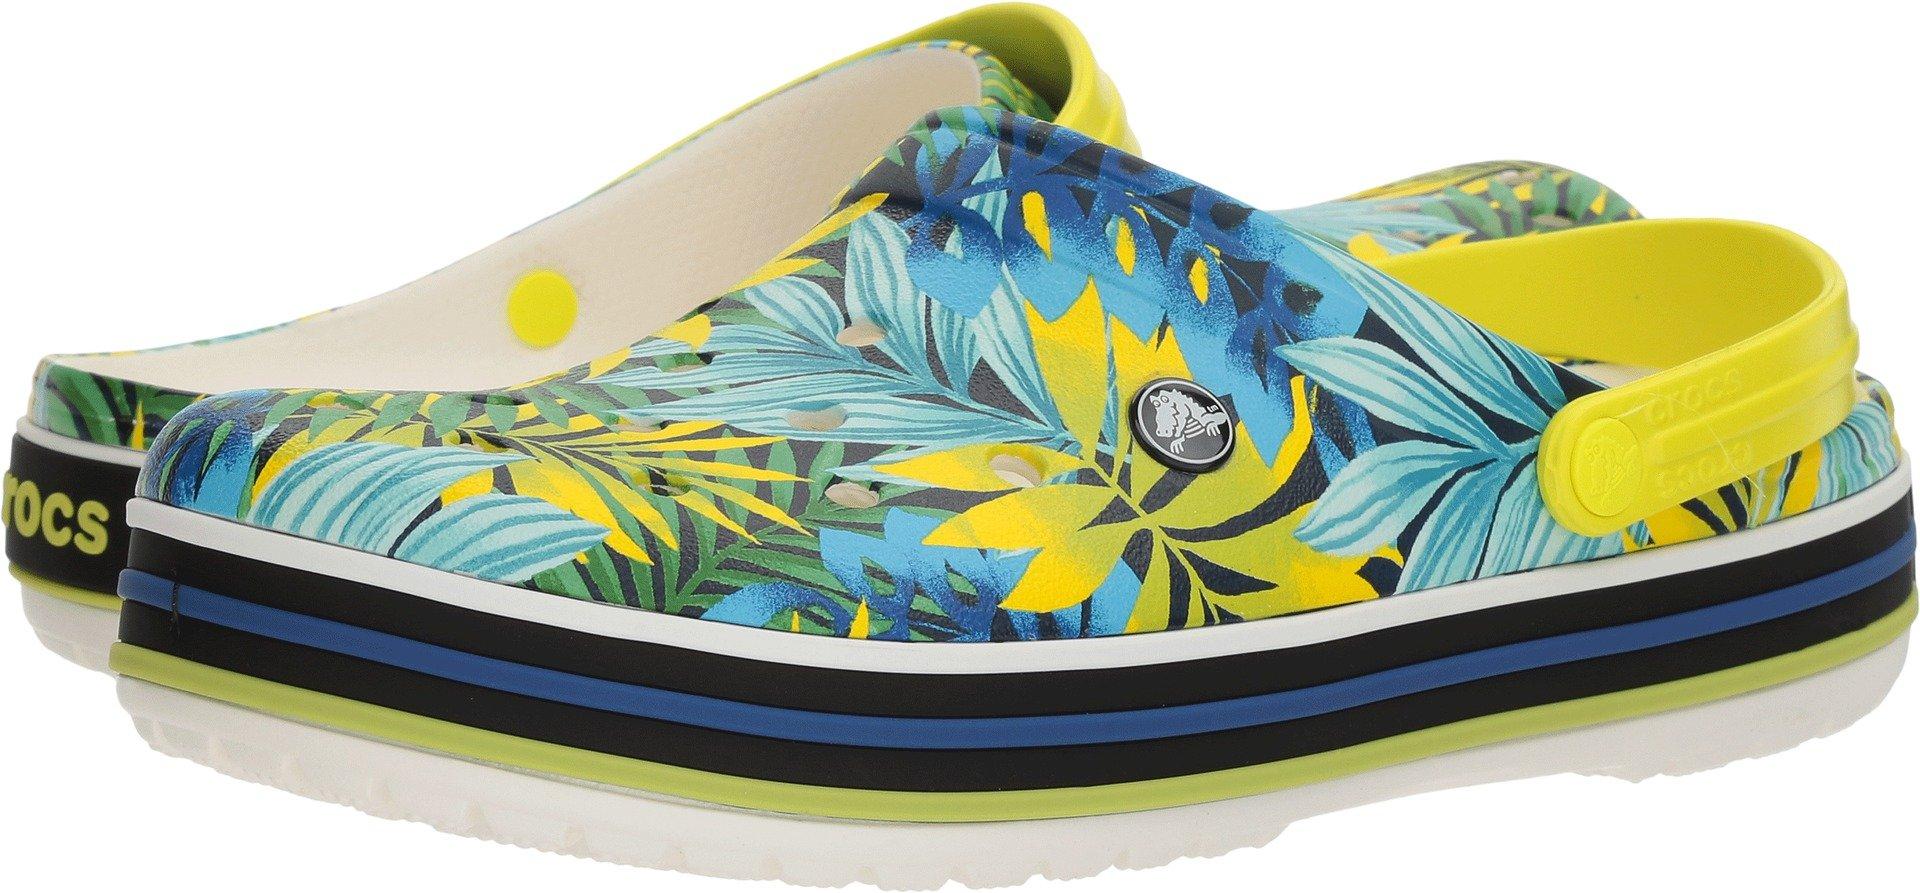 Crocs Crocband Tropical GRPH V Clog, White/Tennis Ball Green, 7 US Men/ 9 US Women M US